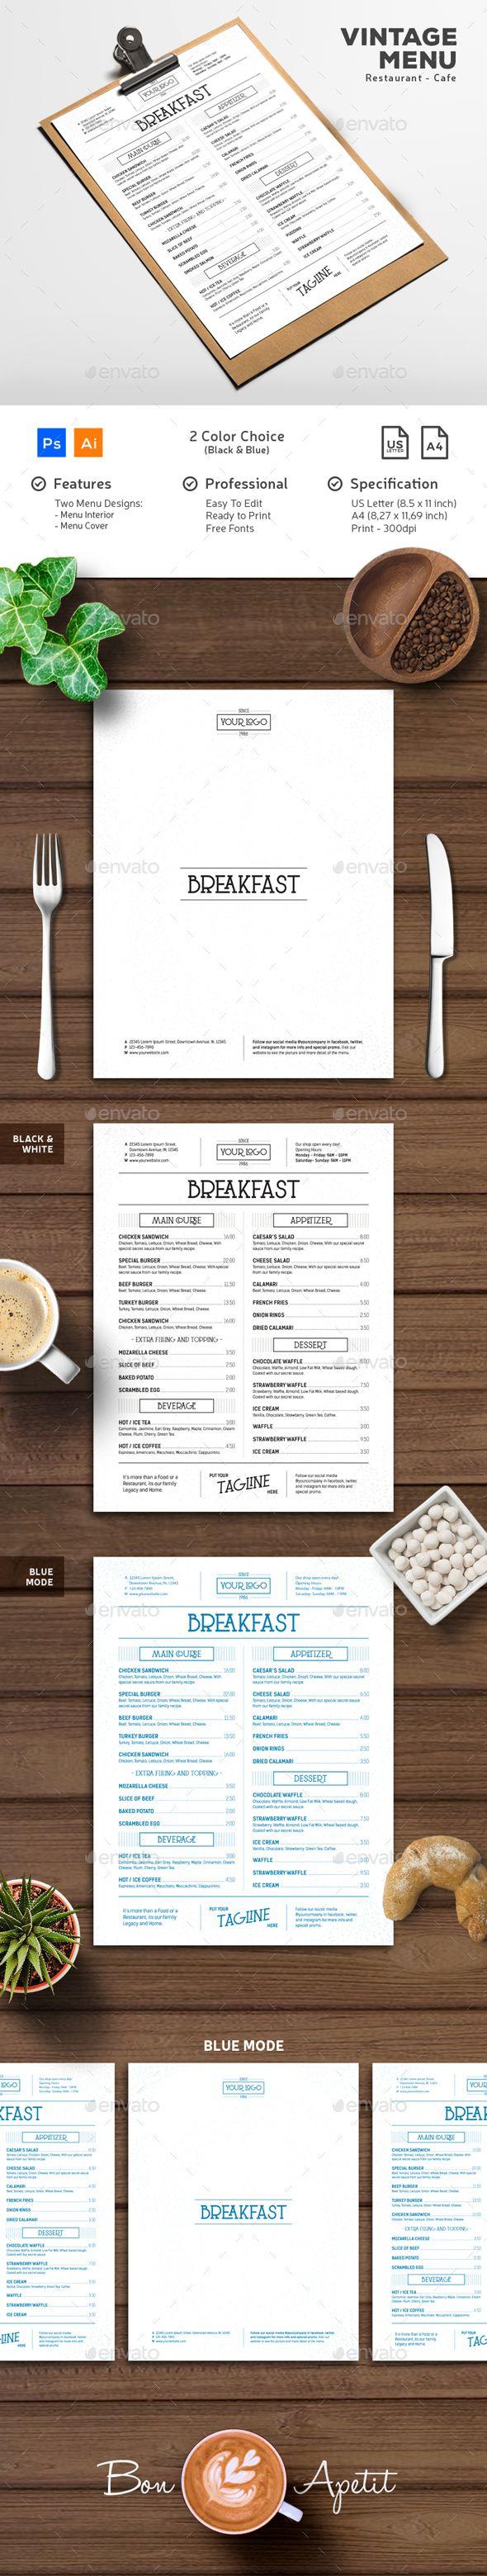 Menu Vintage Typography - #Food #Menus Print #Templates Download here: https://graphicriver.net/item/menu-vintage-typography/19614560?ref=alena994